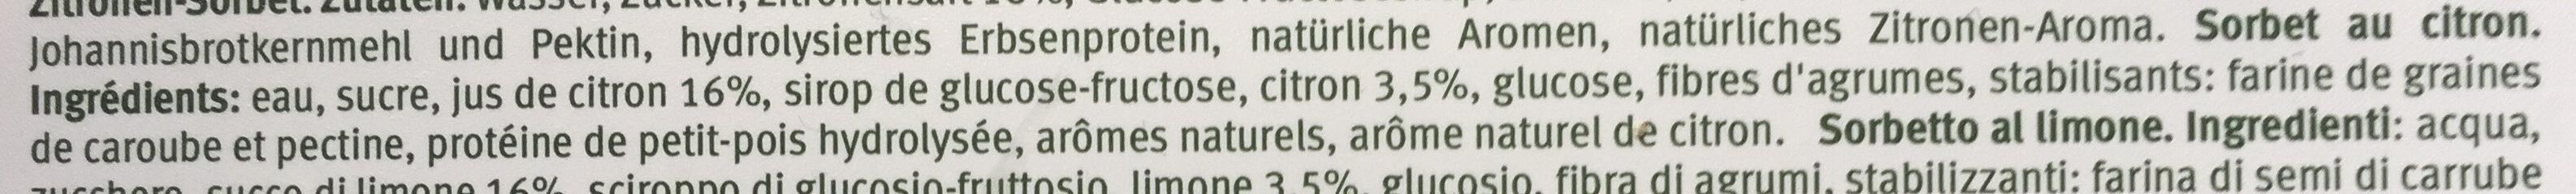 Le sorbet citron - Ingredienti - fr